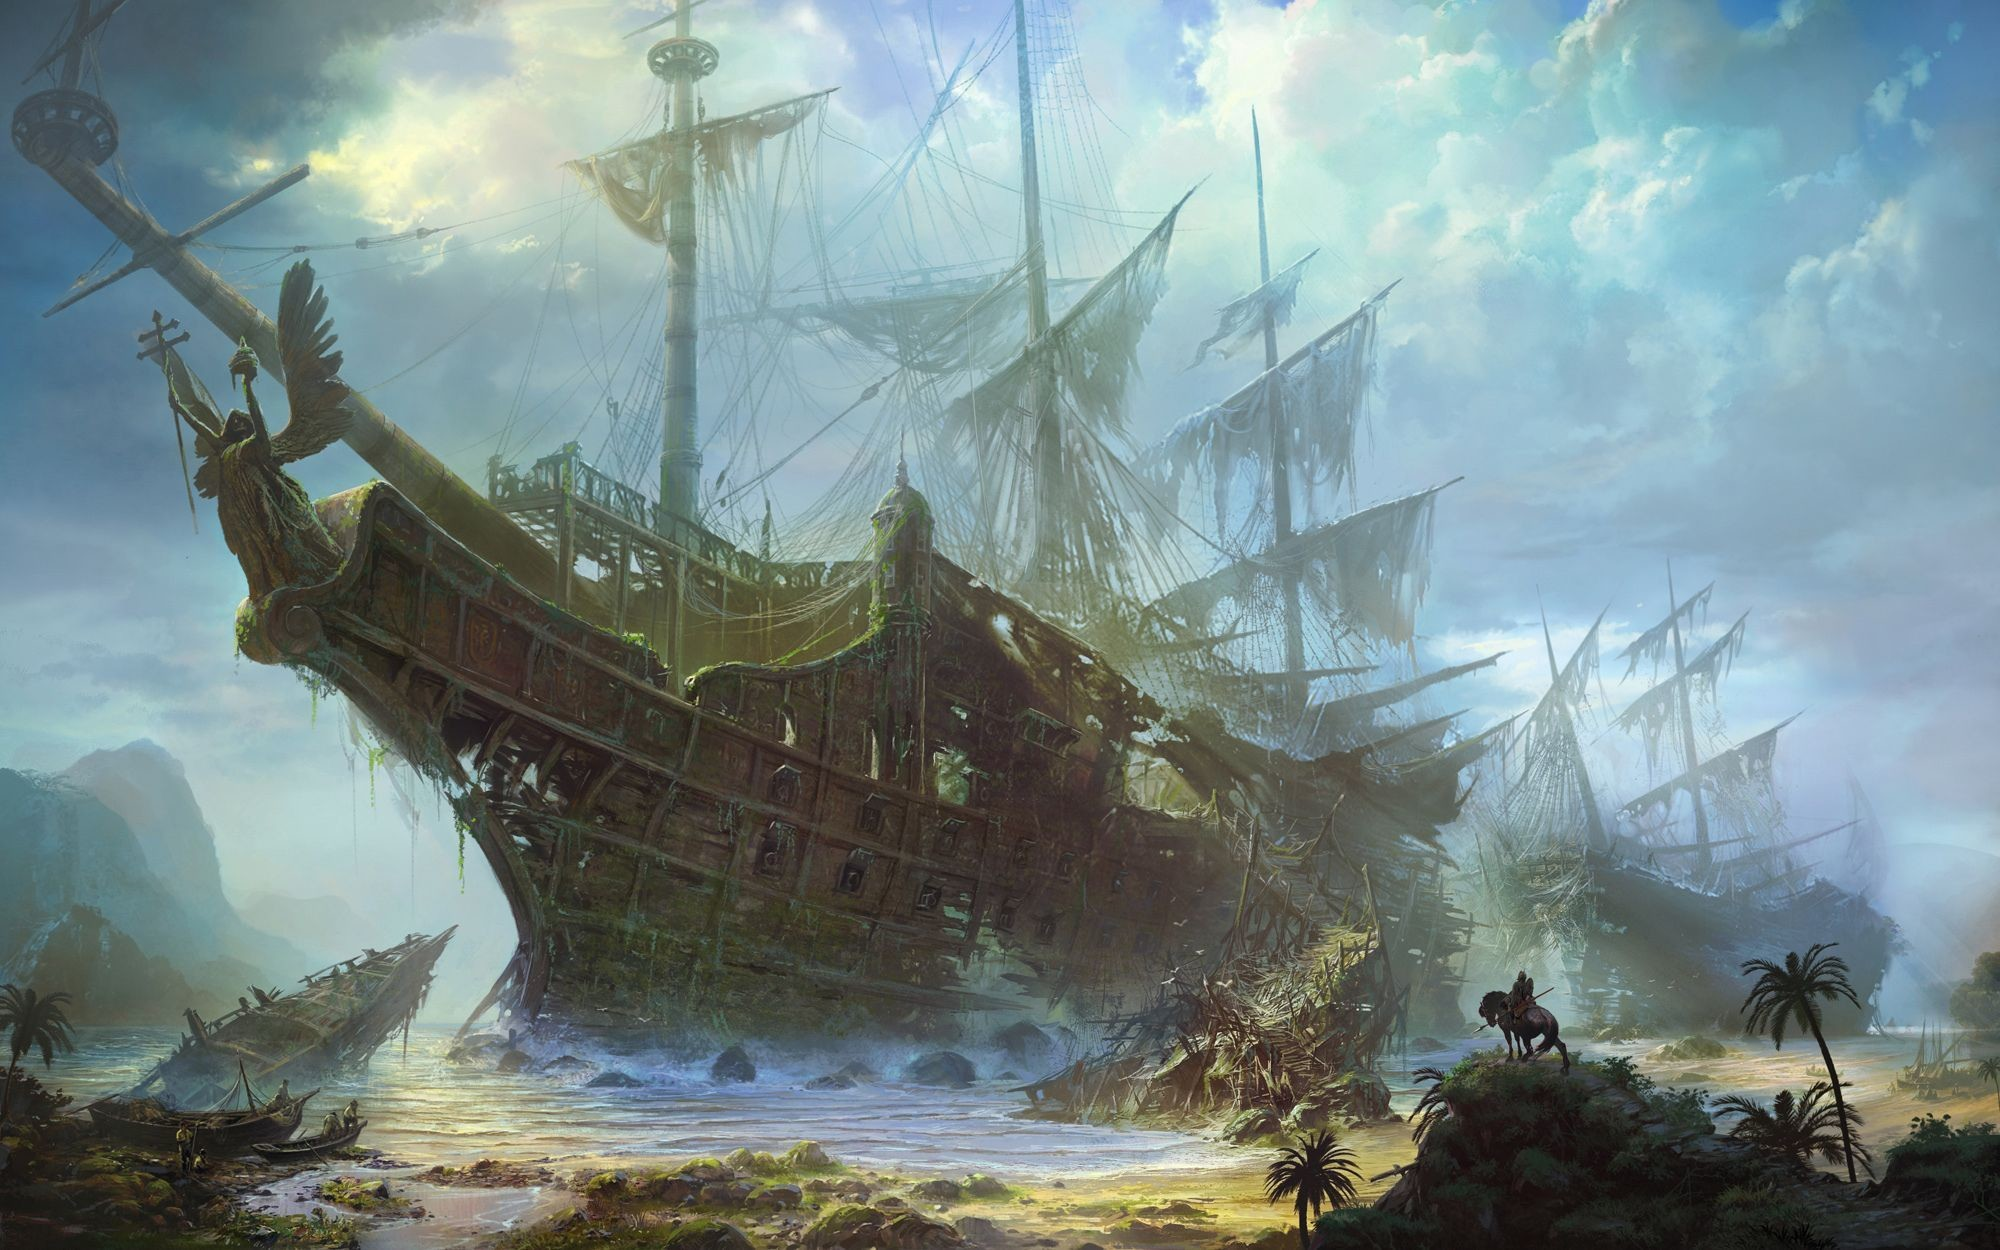 pirate ship wallpaper desktop background A94 – WallPey